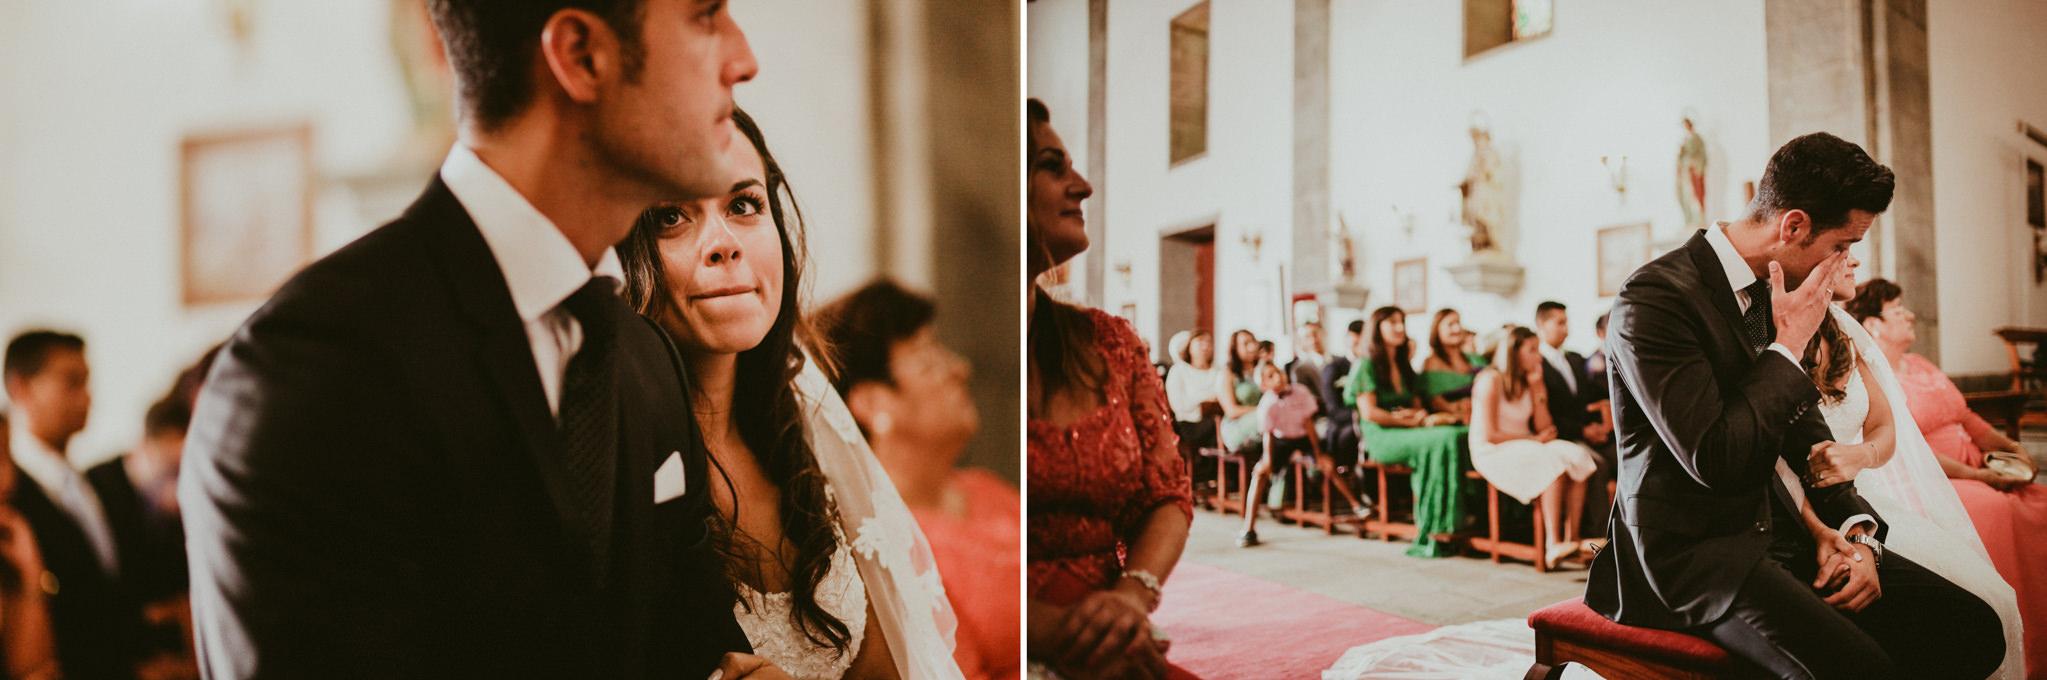 Jessica+Oscar-wedding-121